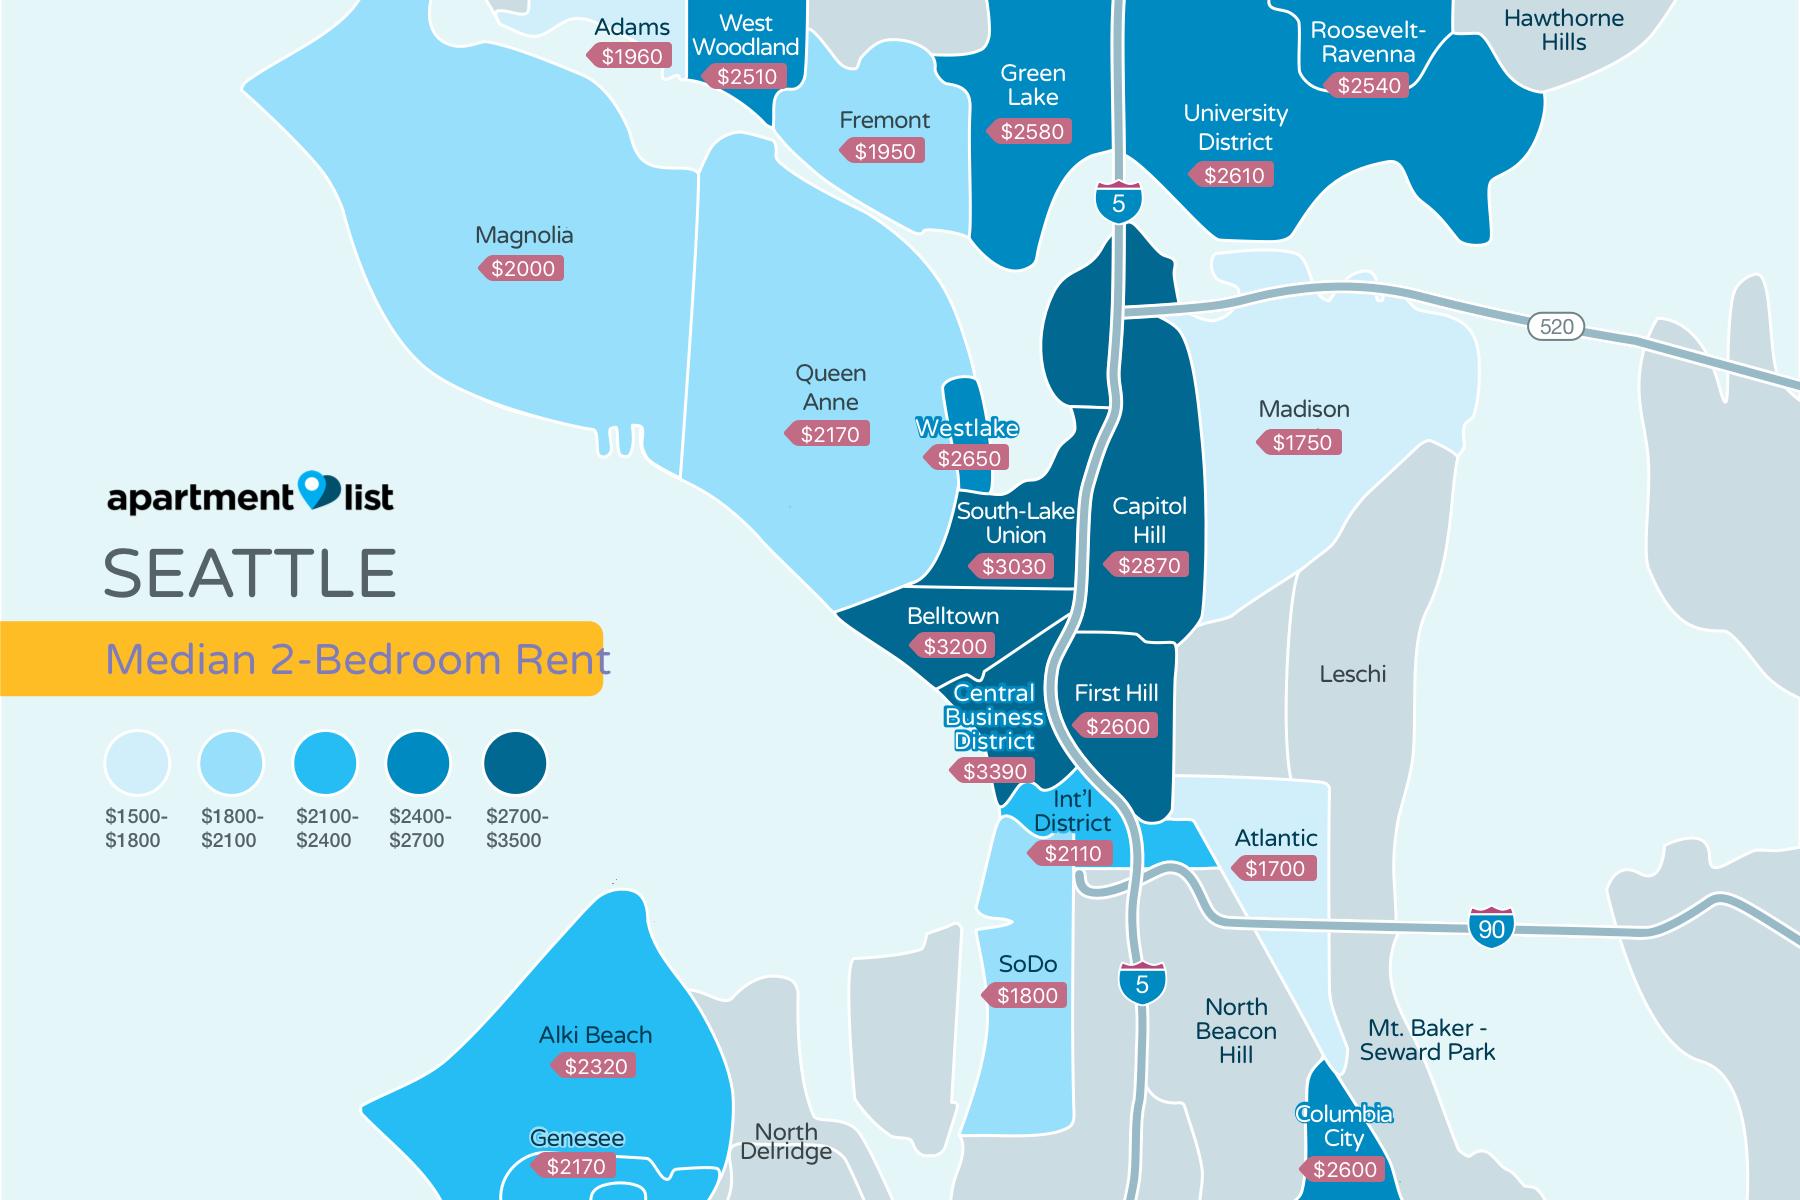 Seattle Neighborhood Price Map